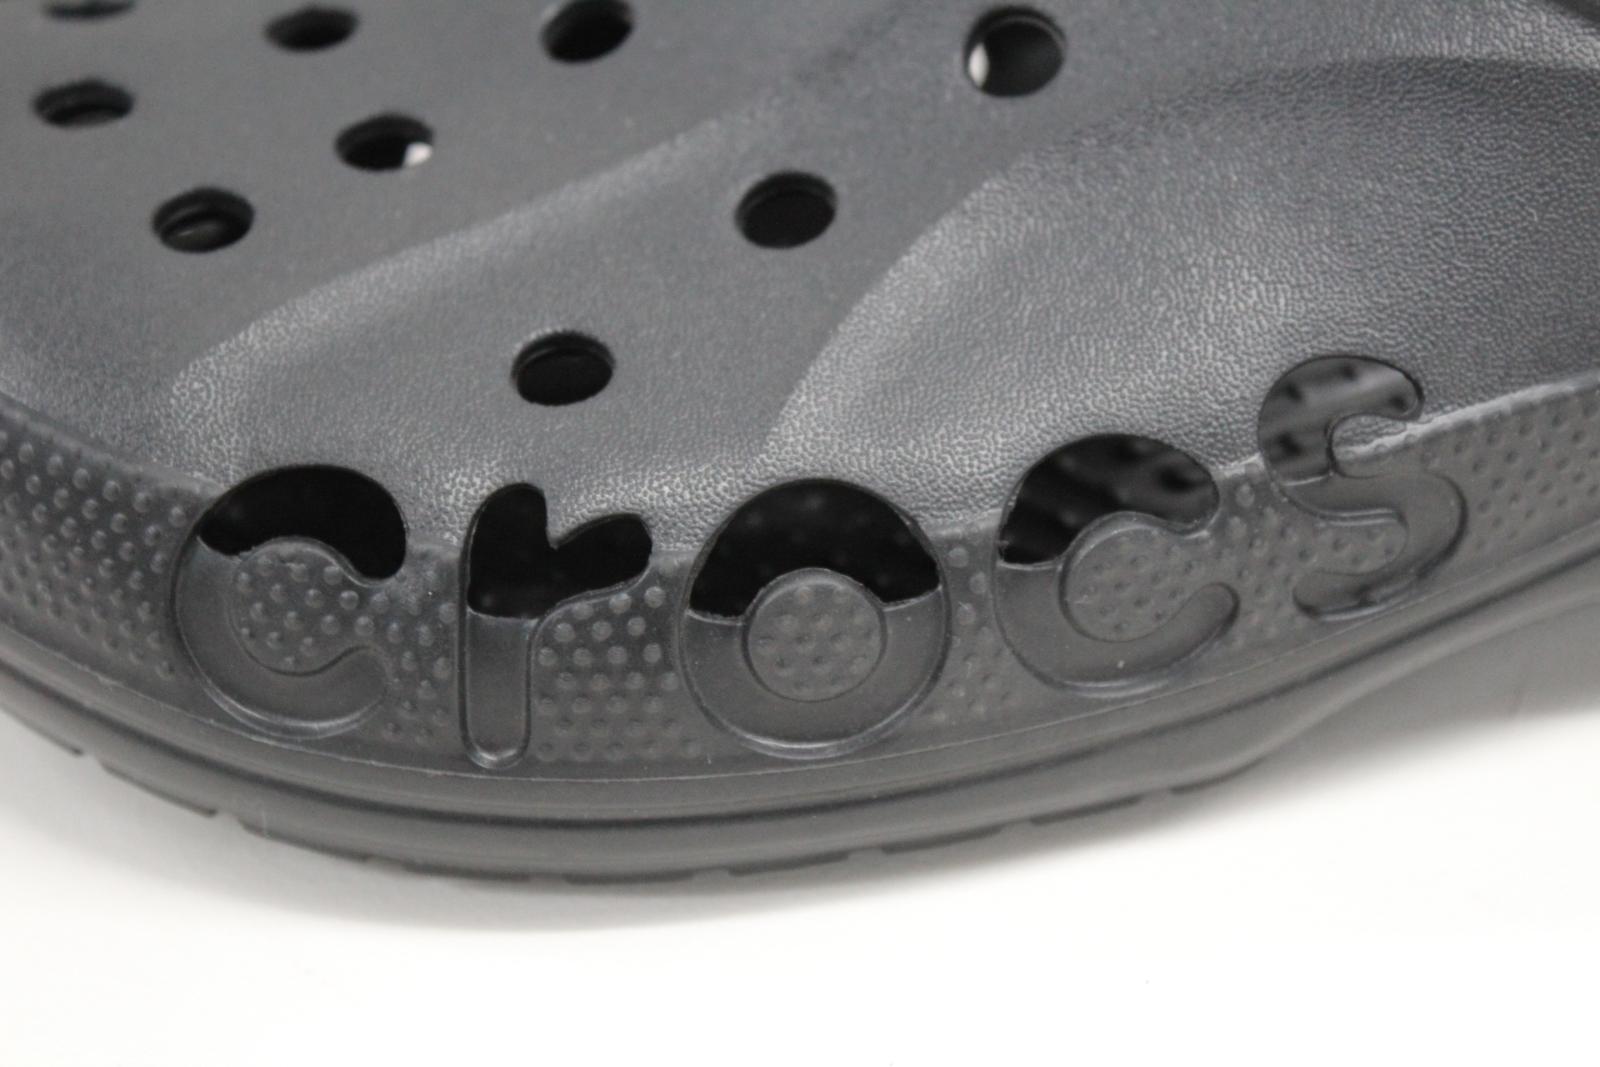 cc8415c91985 CROCS Mens Baya Black Summer Beach Casual Comfort Shoes Sandals Size ...